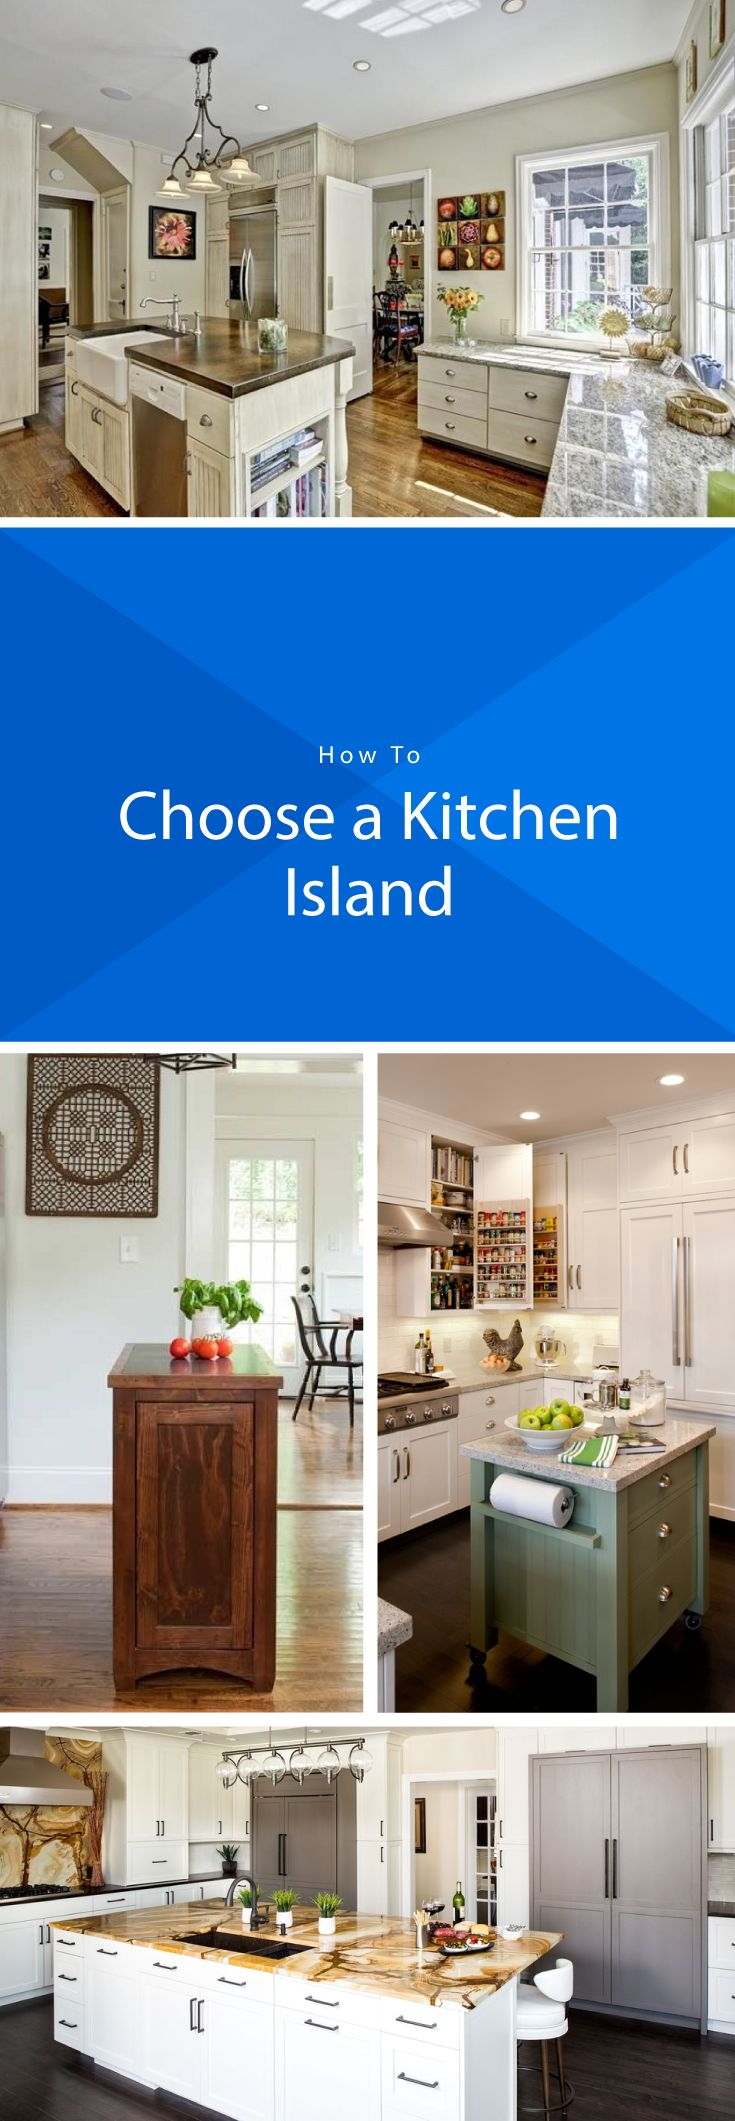 416 best Kitchen Lookbook images on Pinterest | Kitchen ideas ...